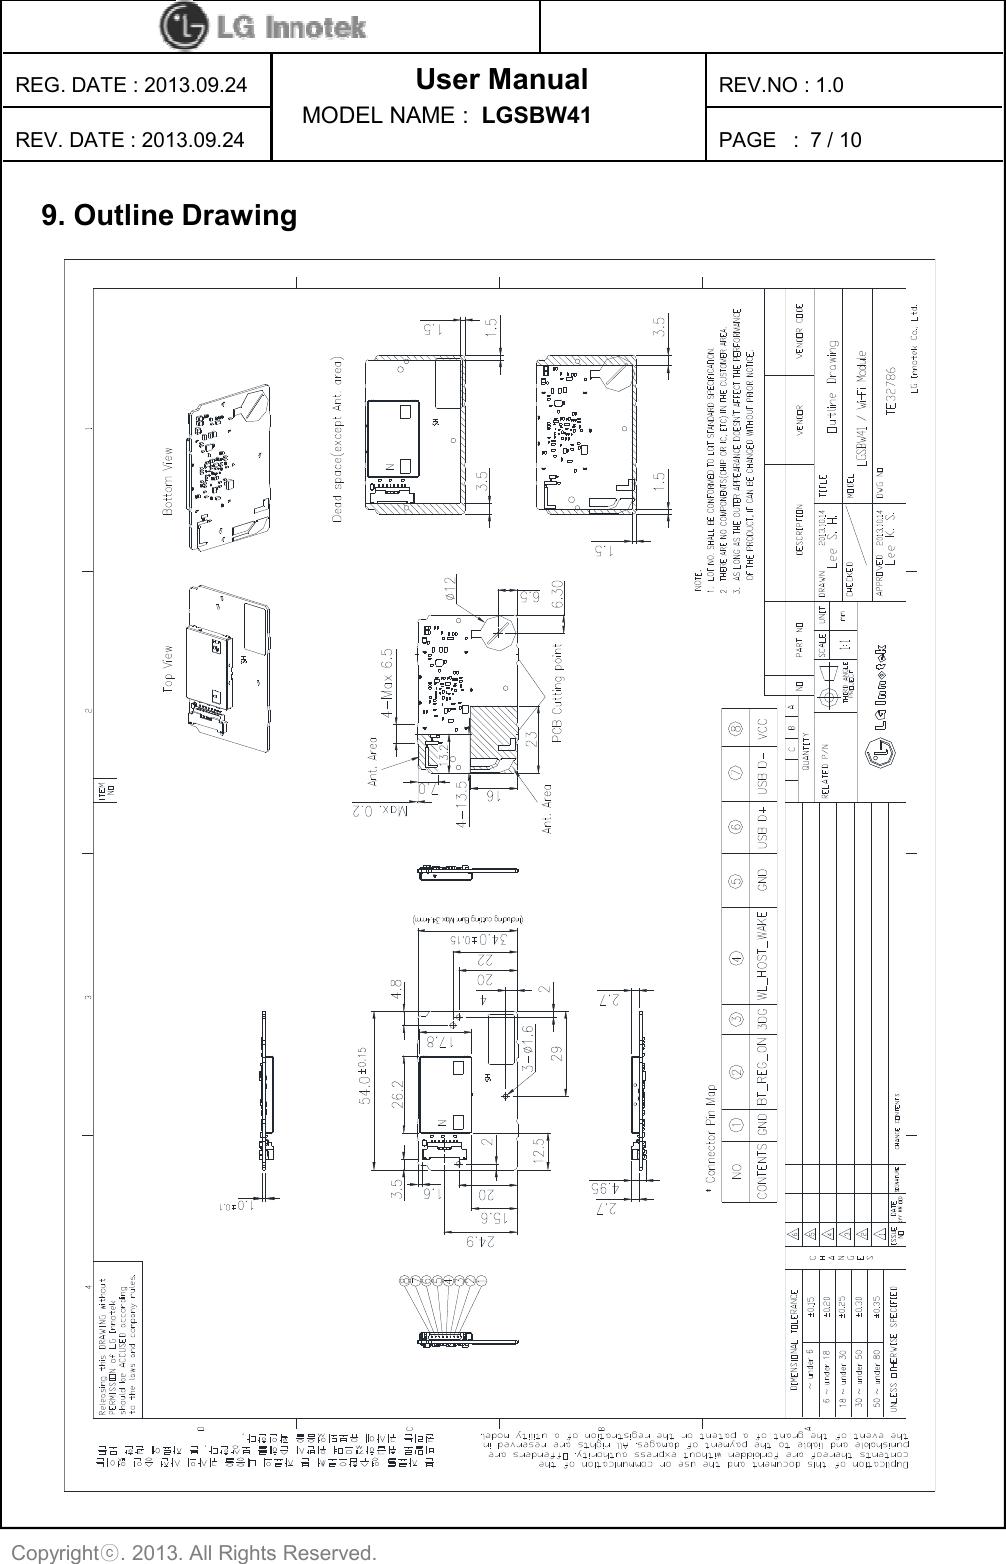 LG Electronics USA LGSBW41 WIFI / BT Combo module User Manual